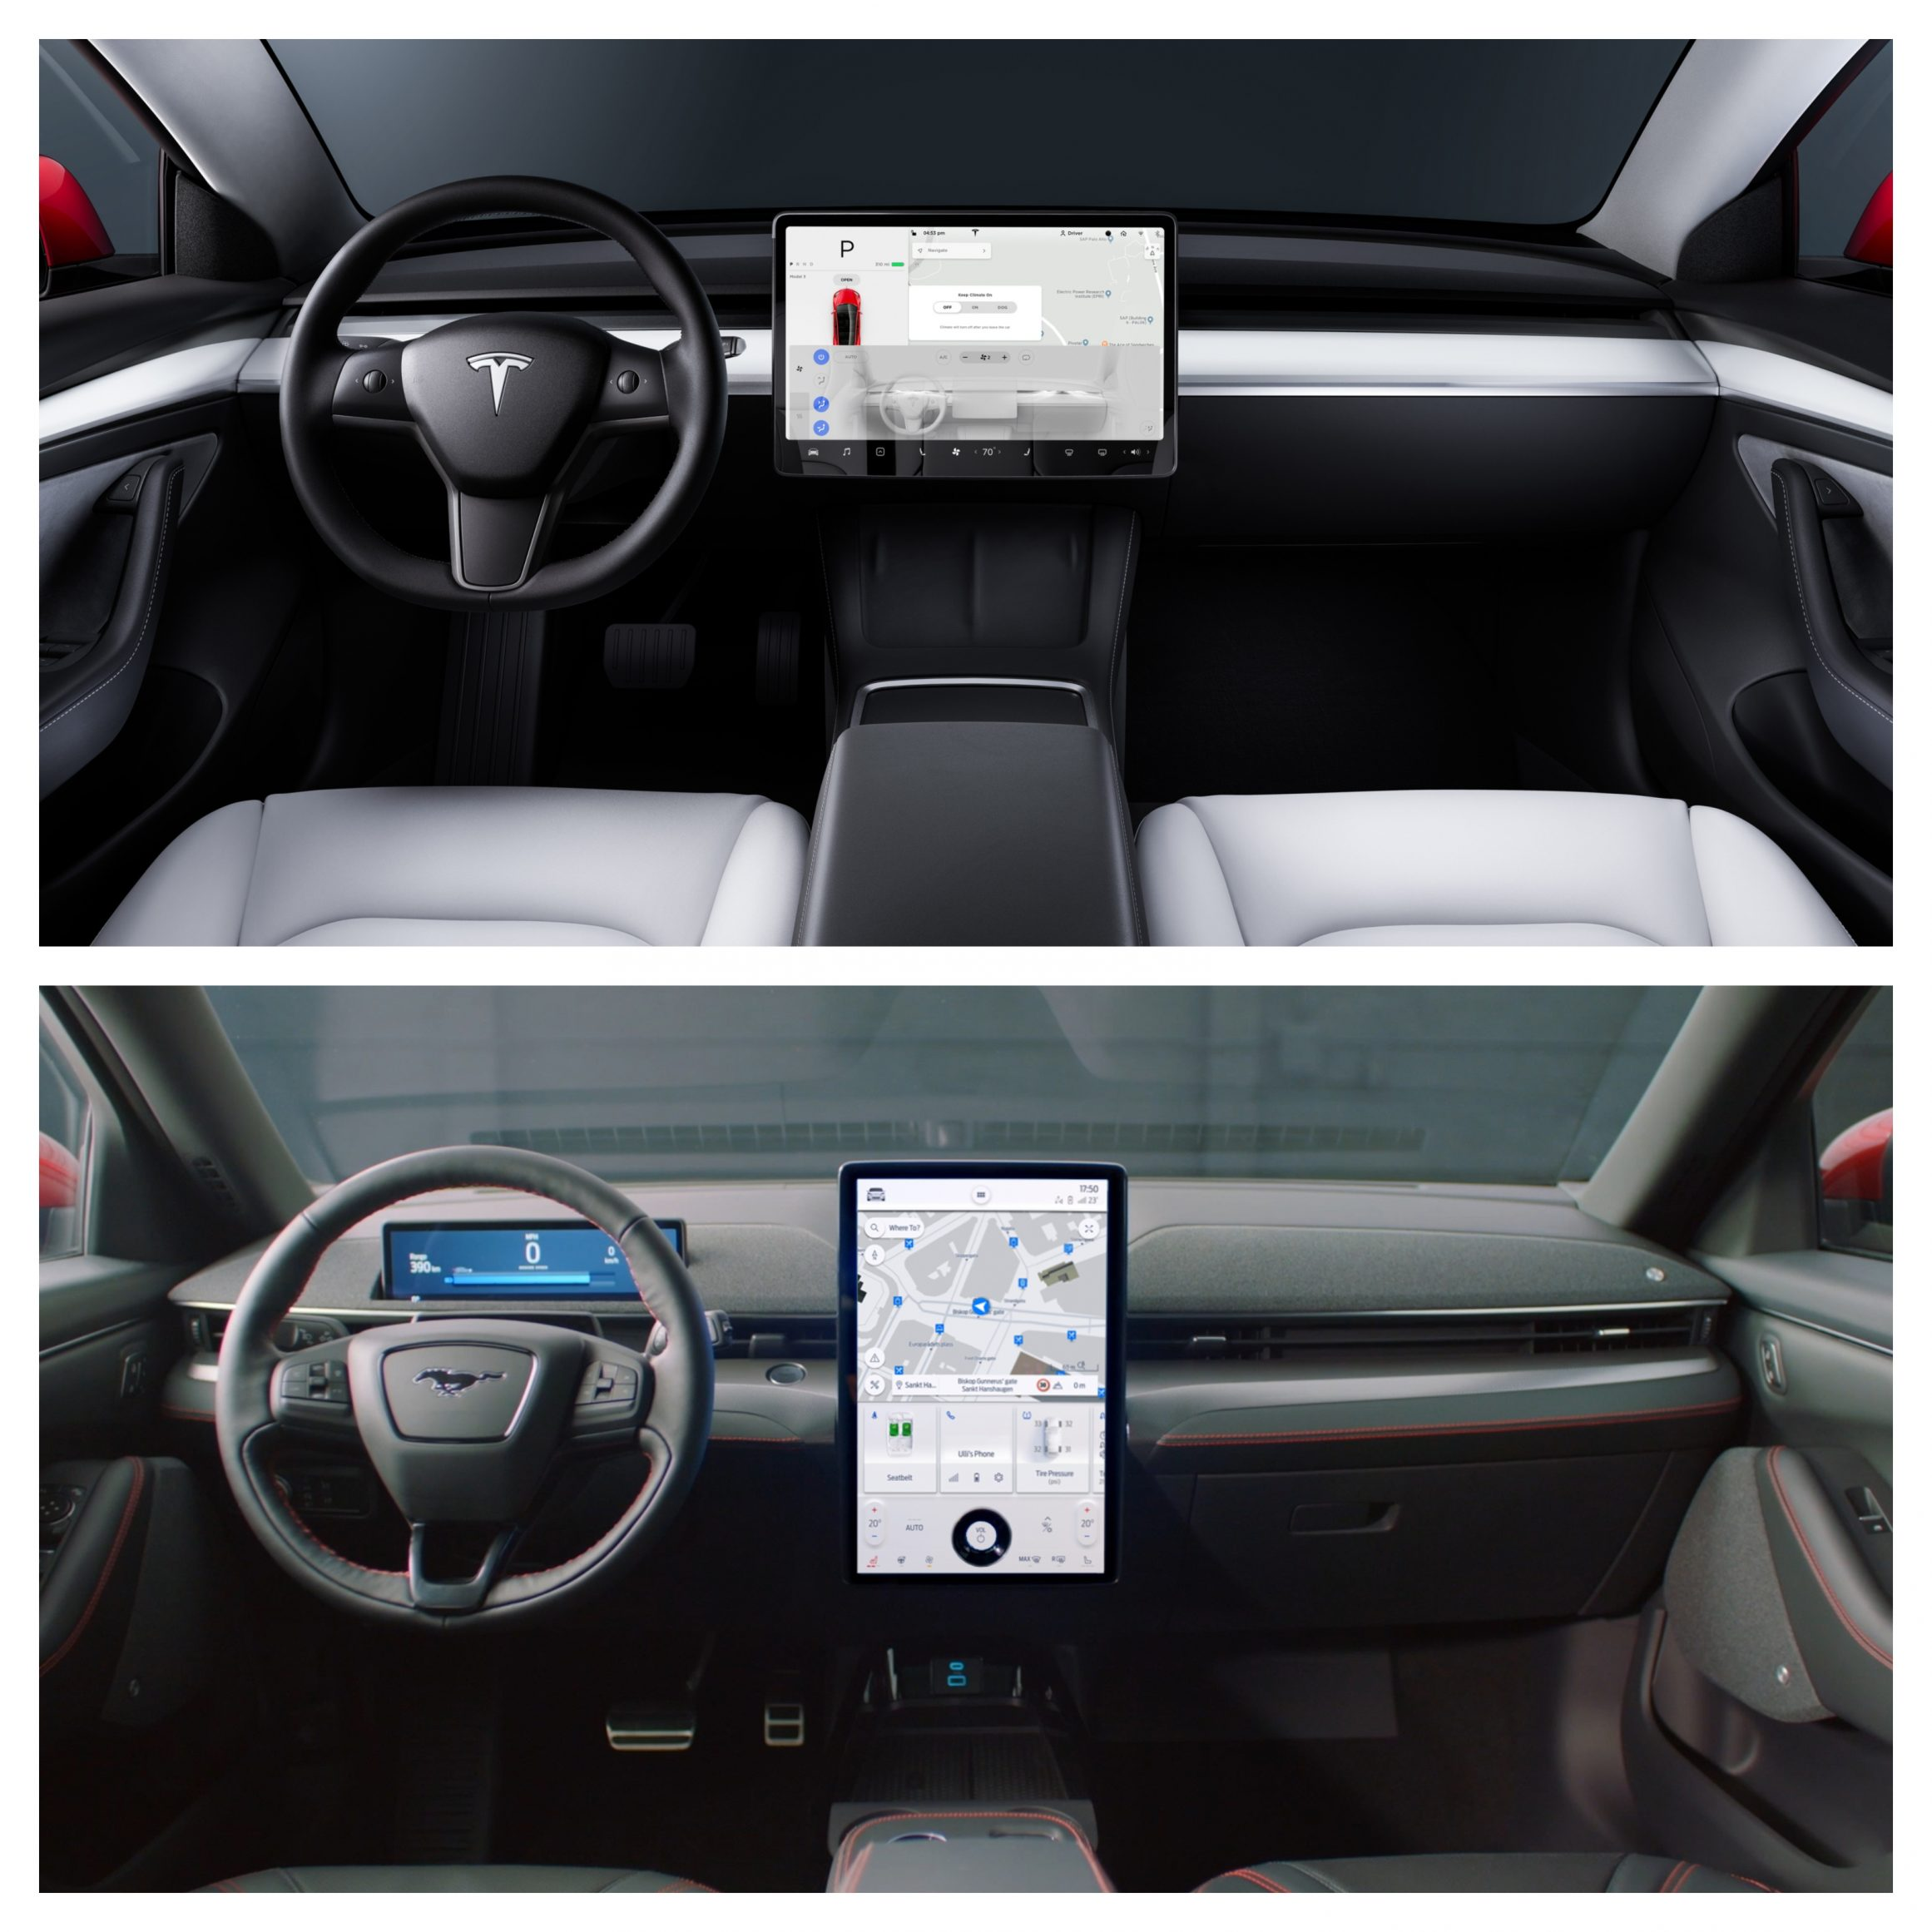 Tesla Model 3 Vs Ford Mustang Mach-E - interior design